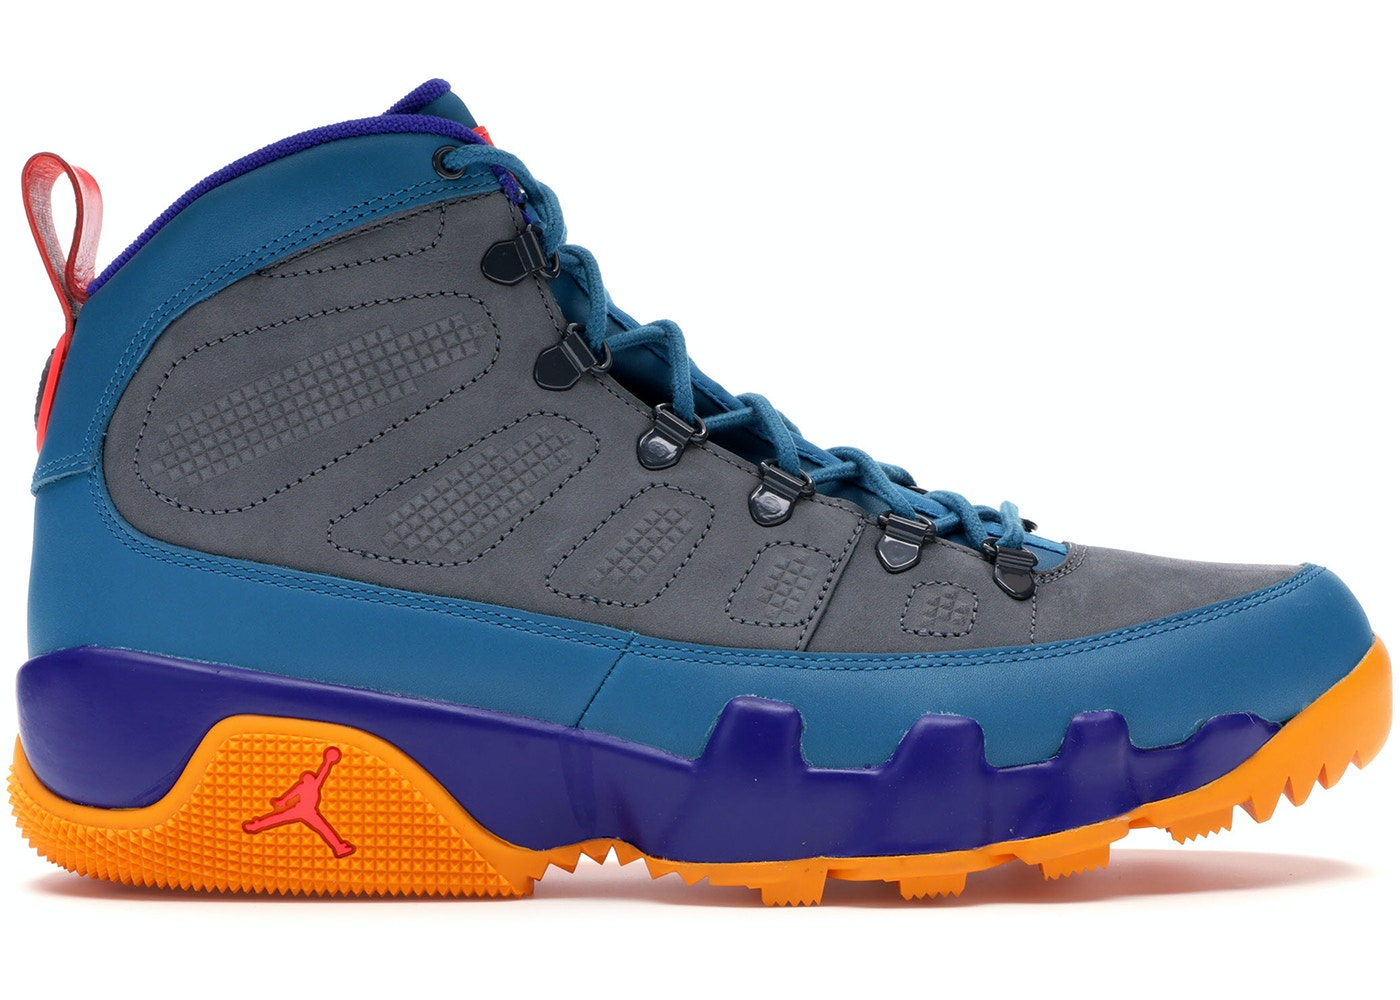 474dfcf67c4 Jordan 9 Retro Boot Green Abyss - AR4491-300